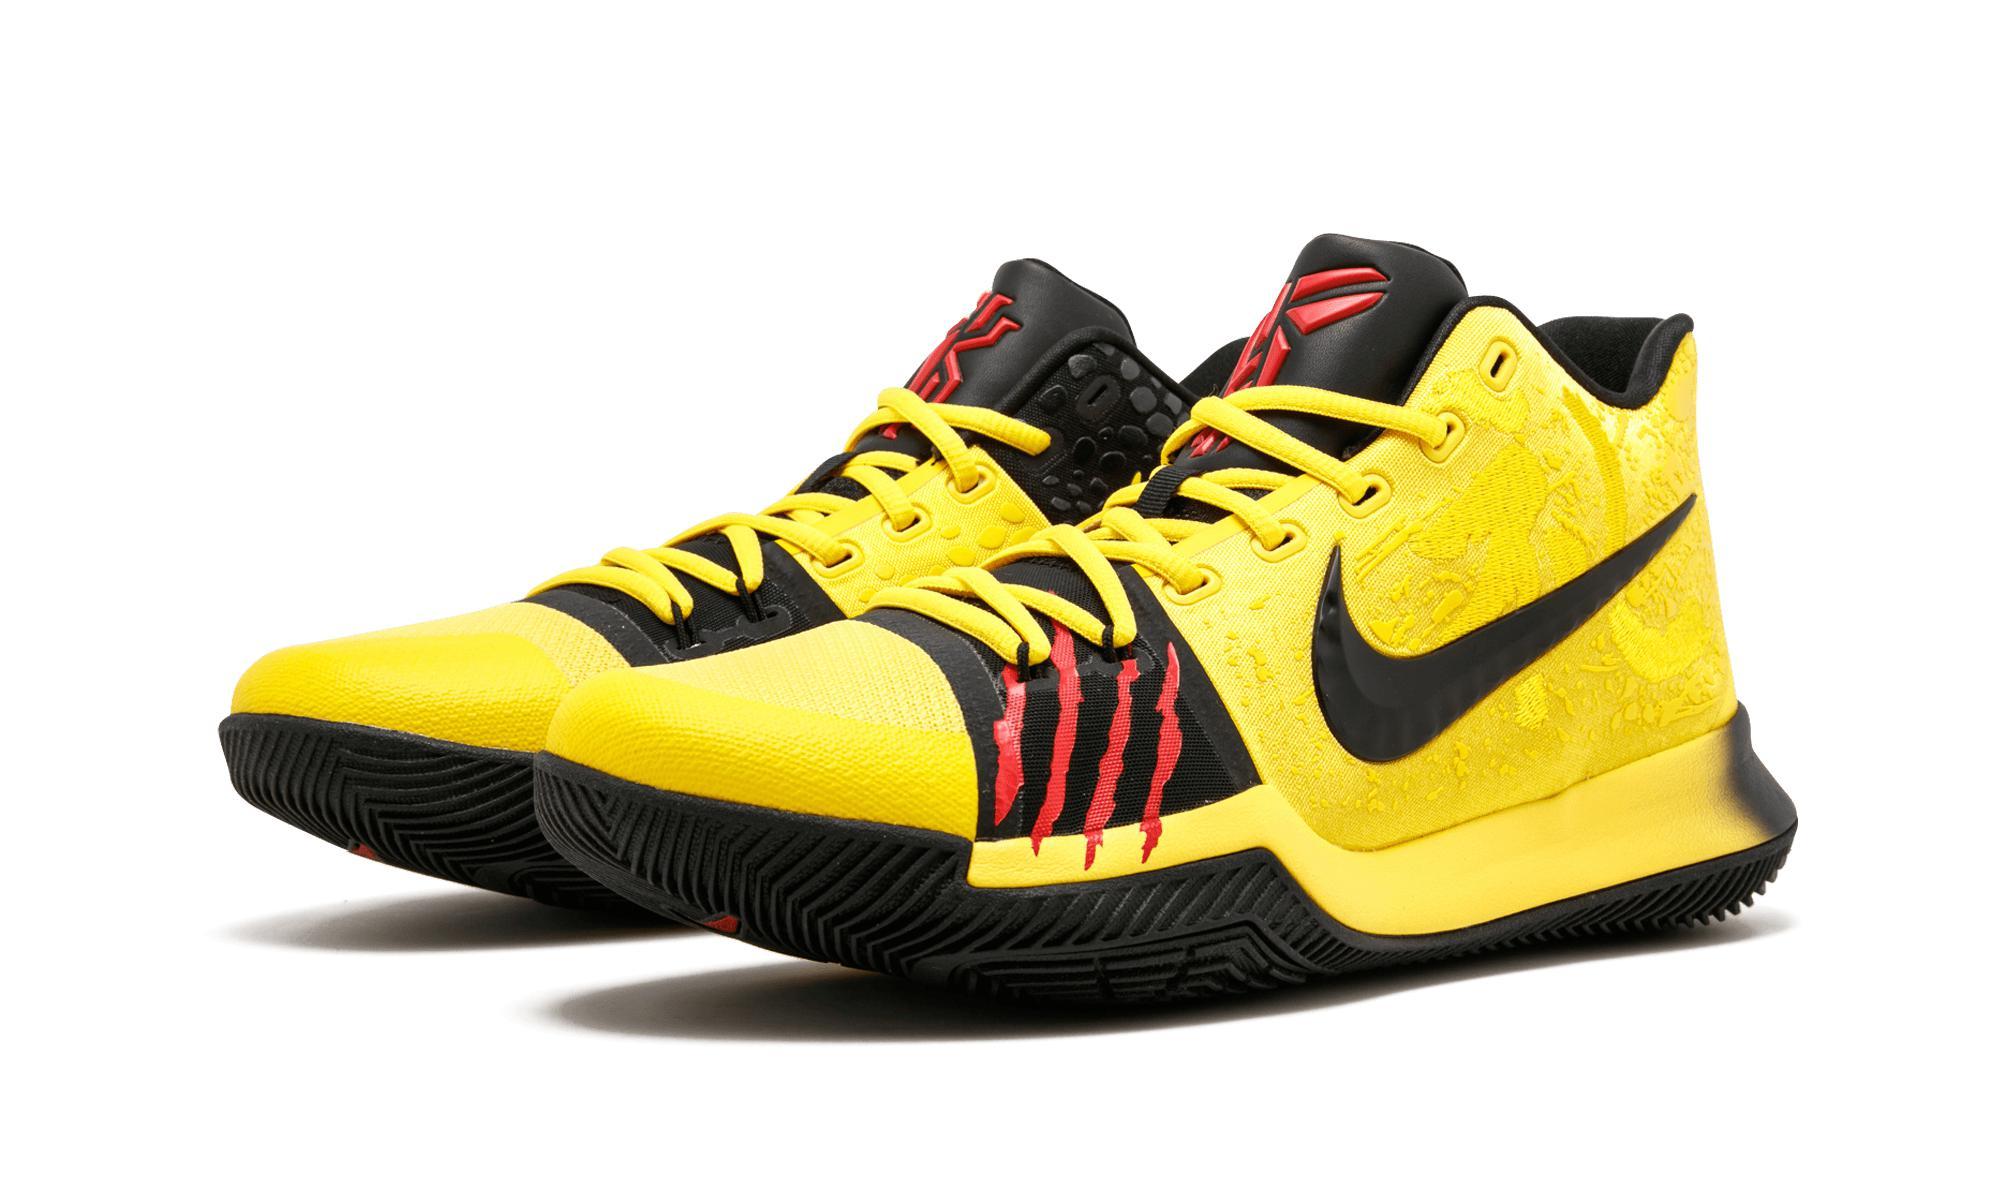 b3a0e32f890e Nike - Yellow Kyrie 3 Mm for Men - Lyst. View fullscreen